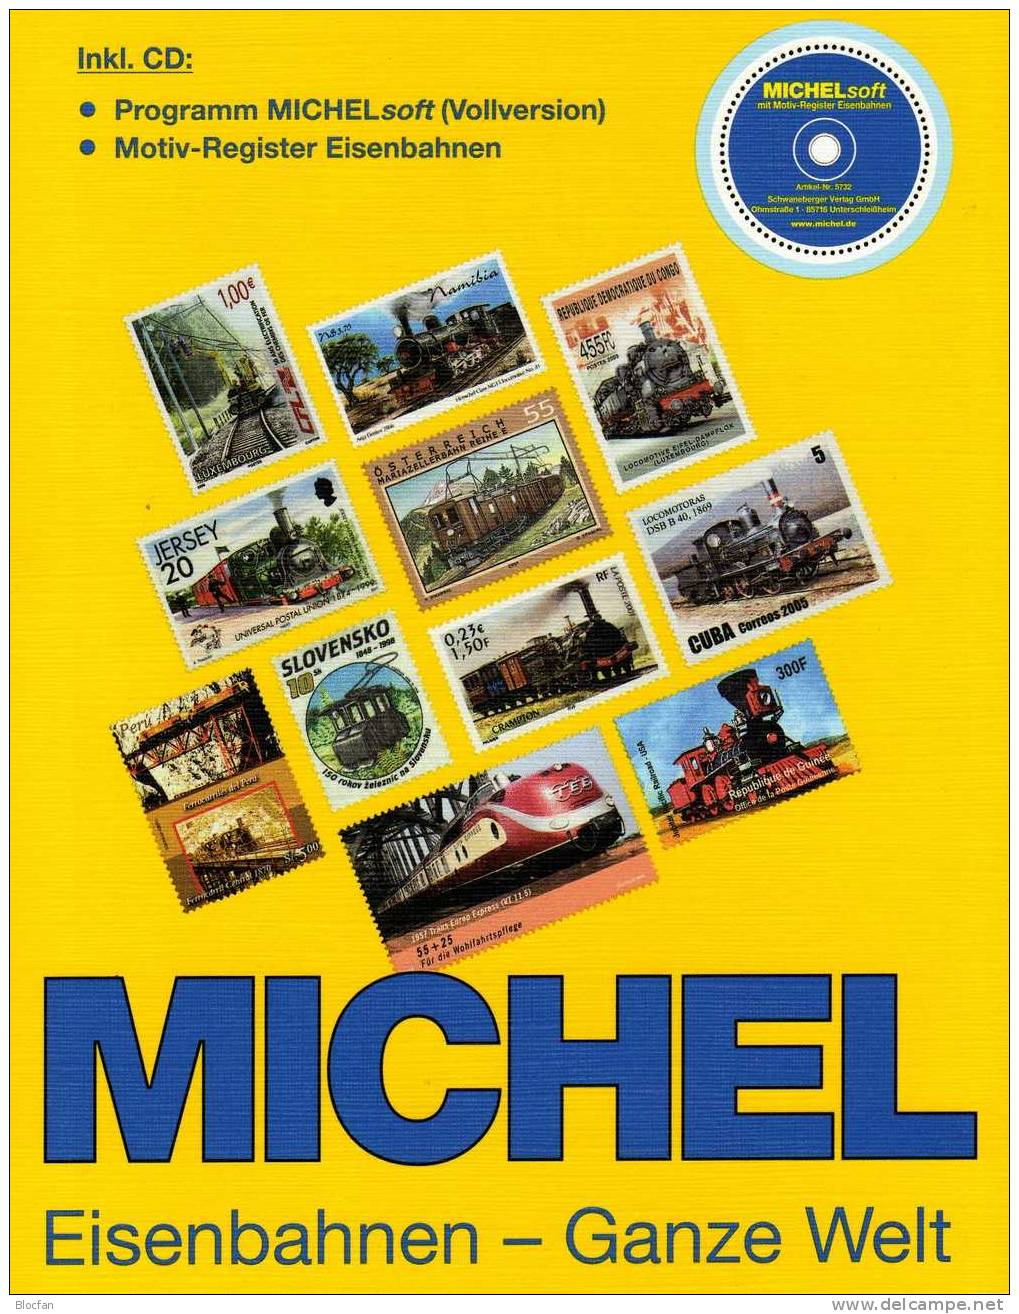 Stamps Eisenbahnen Ganze Welt Michel Motiv-Katalog 2007 Neu 98€ Namensregister Lokomotiven Topics Of Train Locomotiven - Verkehr & Transport